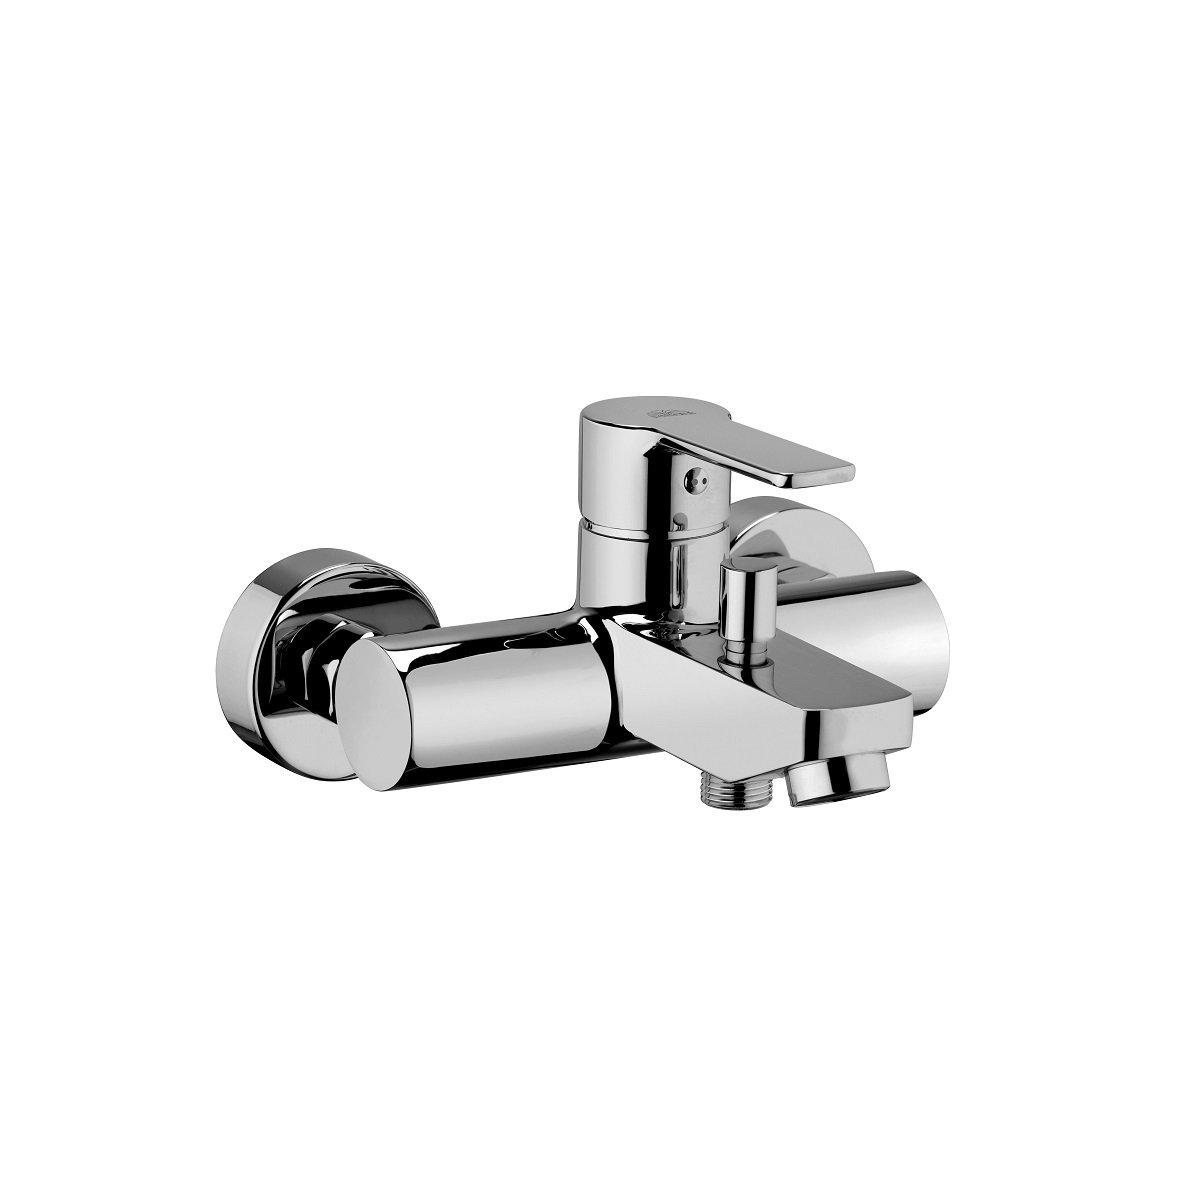 Cheap Bath Mixer Tap Shower Head Diverter, find Bath Mixer Tap ...